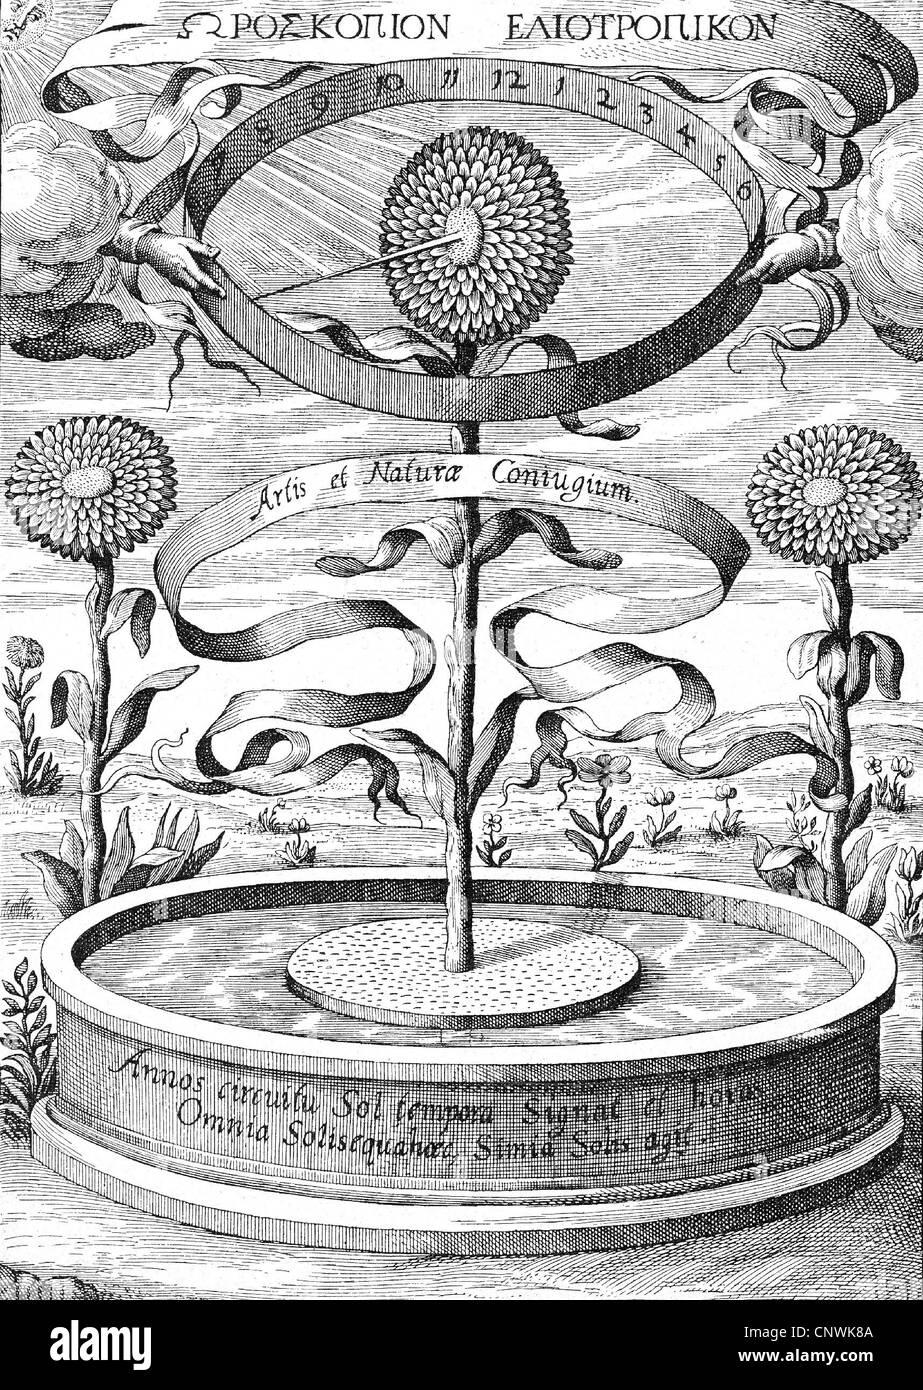 clocks, sundial, 'Horoscopium botanicum', sunflower as clock, copper engraving to 'De arte magnetica' - Stock Image